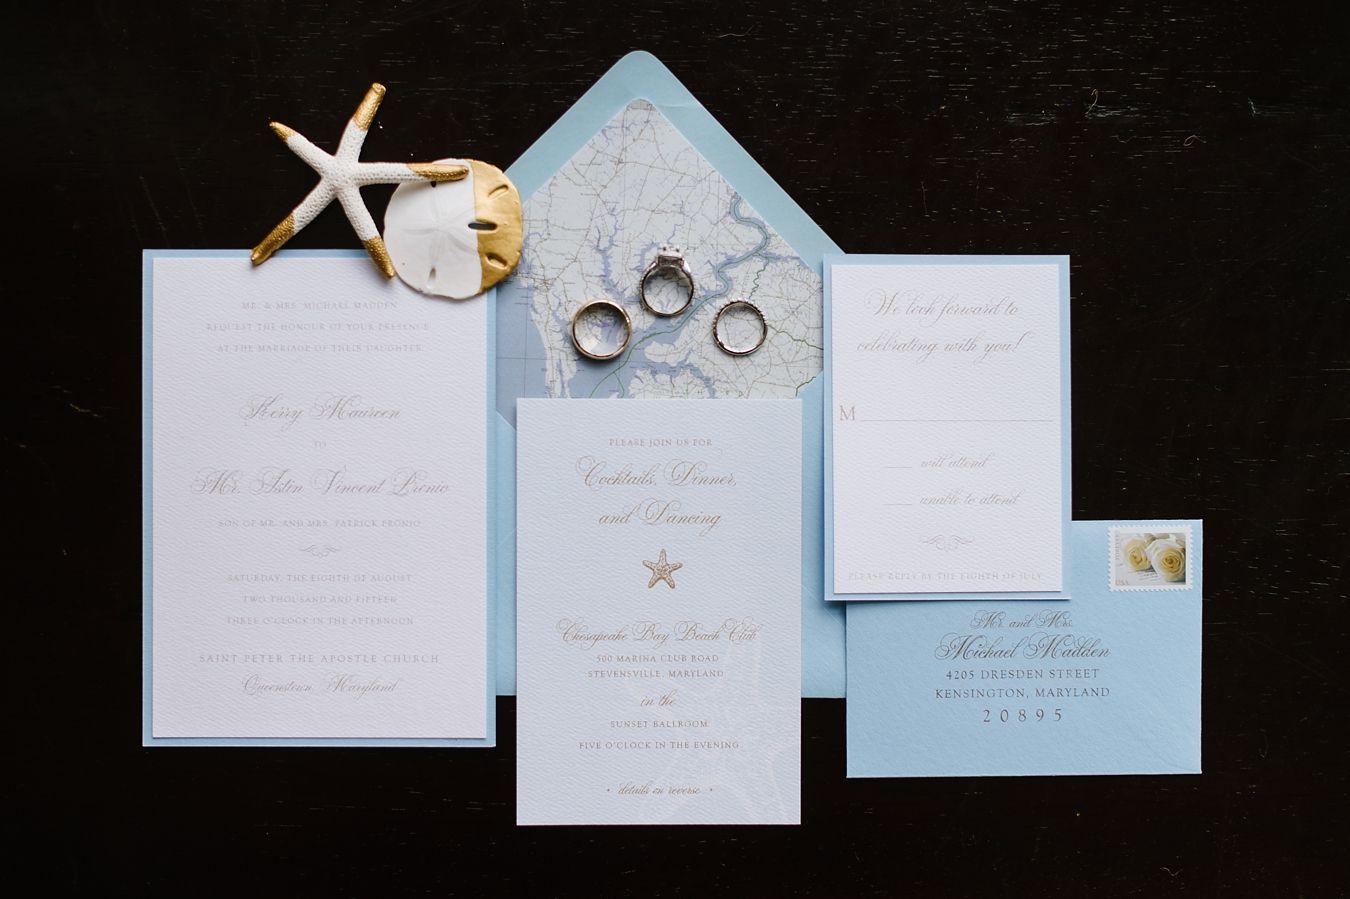 Maryland + Destination Wedding Photographer: Natalie Franke ...